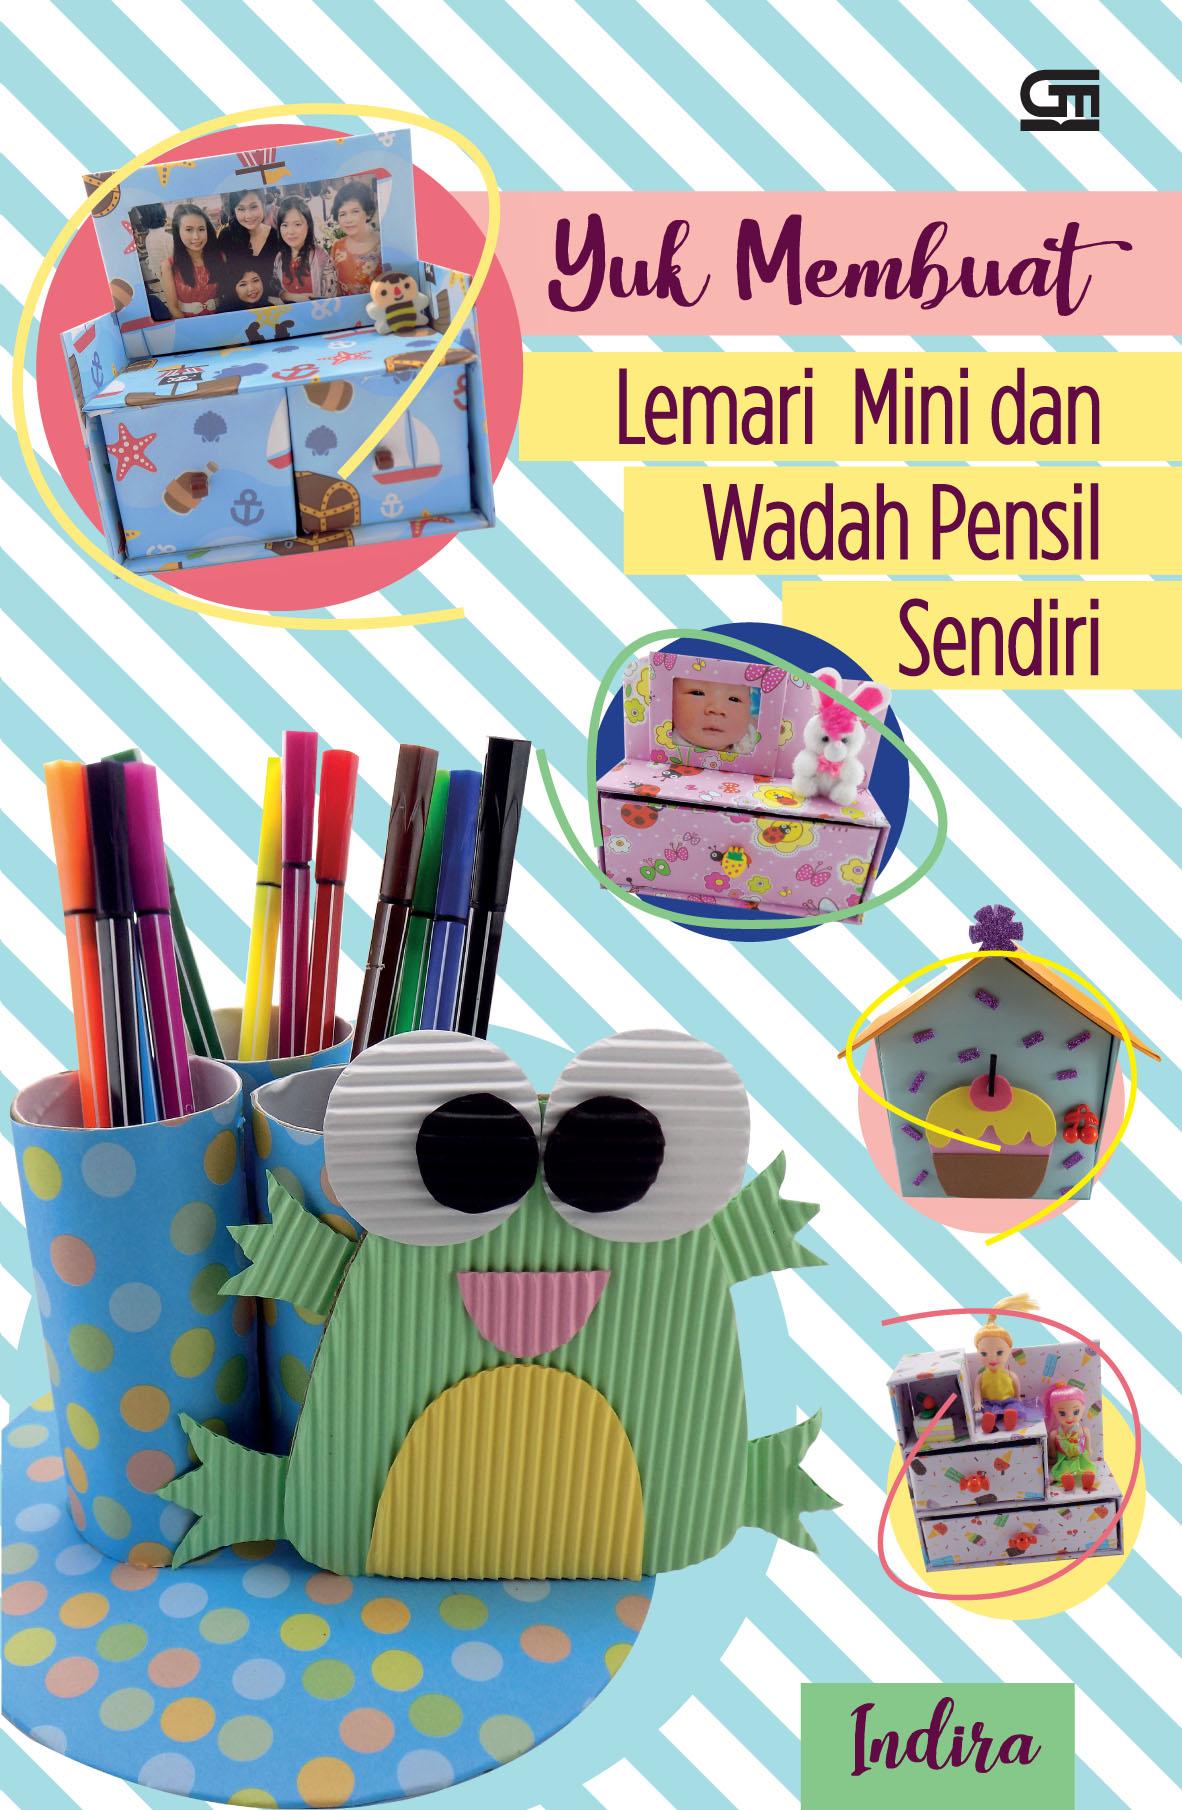 Yuk Membuat Lemari Mini dan Wadah Pensil Sendiri